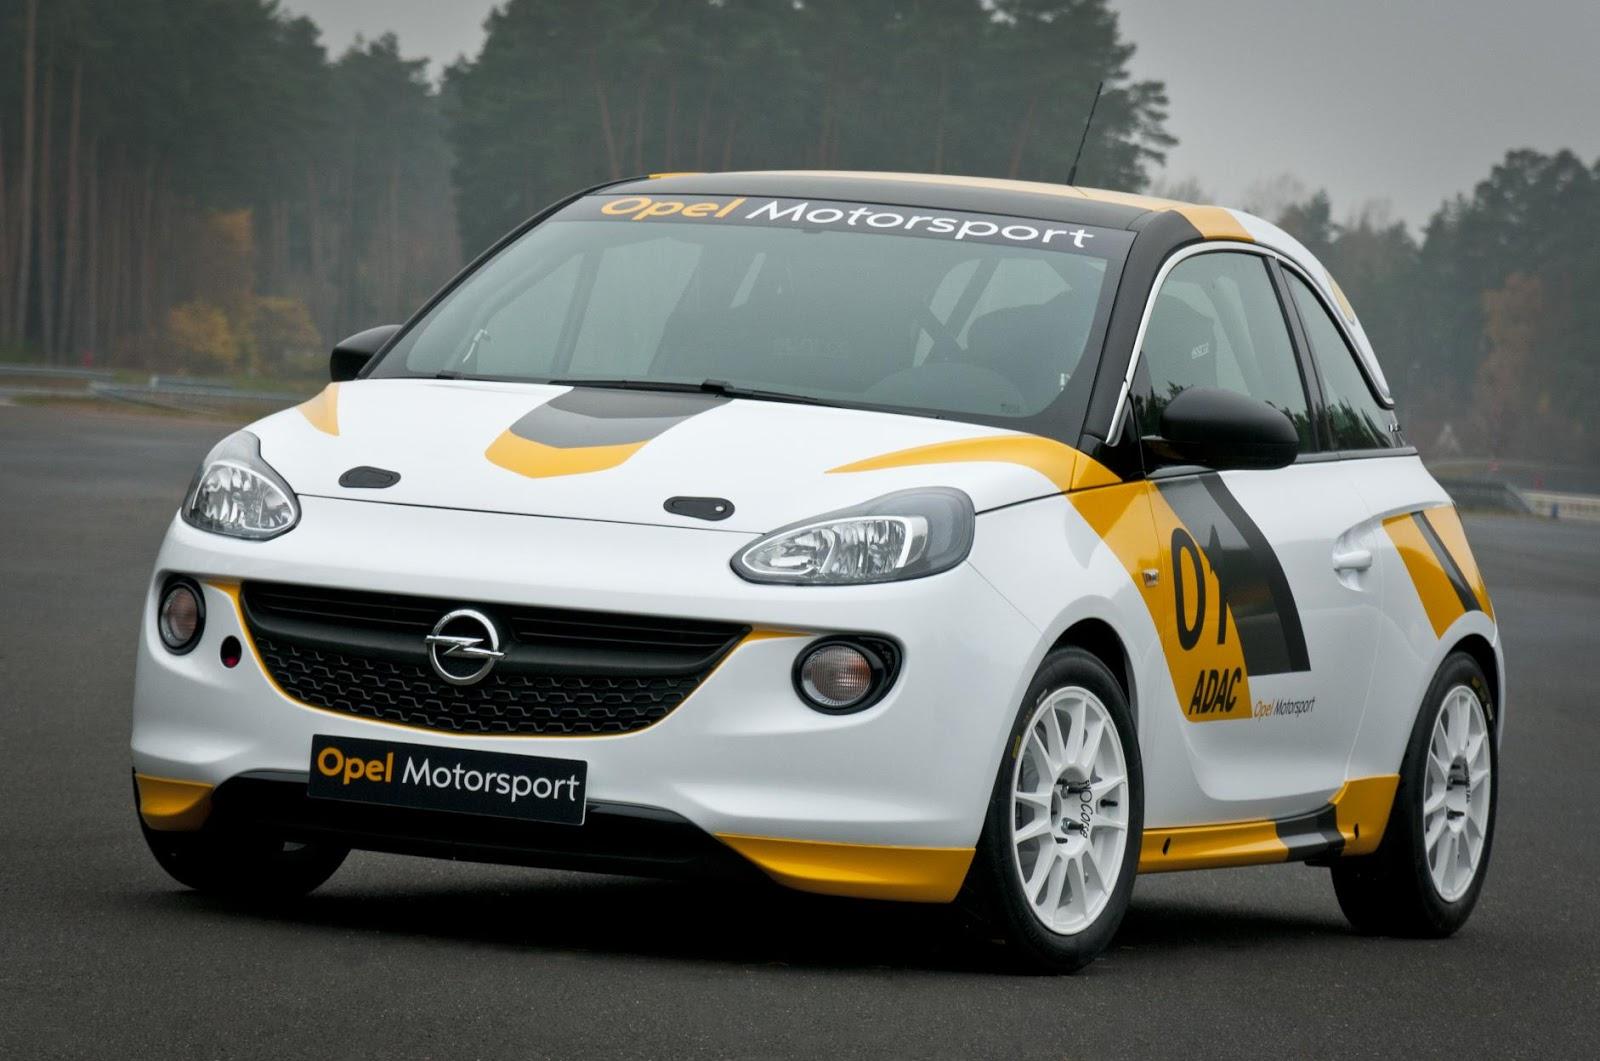 Speedmonkey: Vauxhall/Opel ADAM rally car